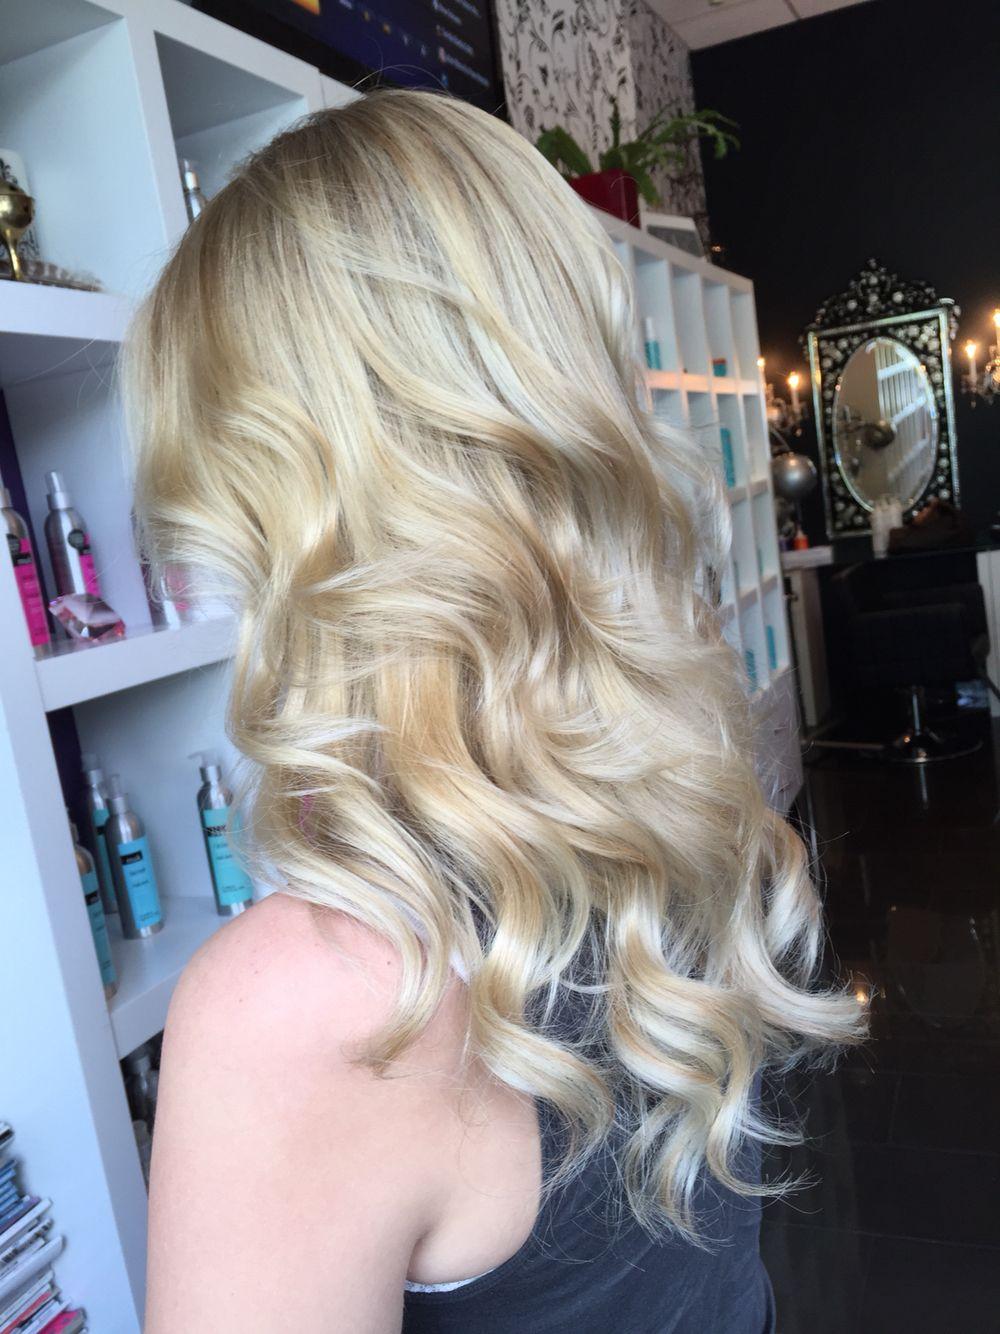 Positivity Hair Studio Positivityhairstudio Staten Island Ny 8 Johnson Street 10309 Hair Love Quotes Instagram P Long Hair Styles Hair Studio Hair Makeup